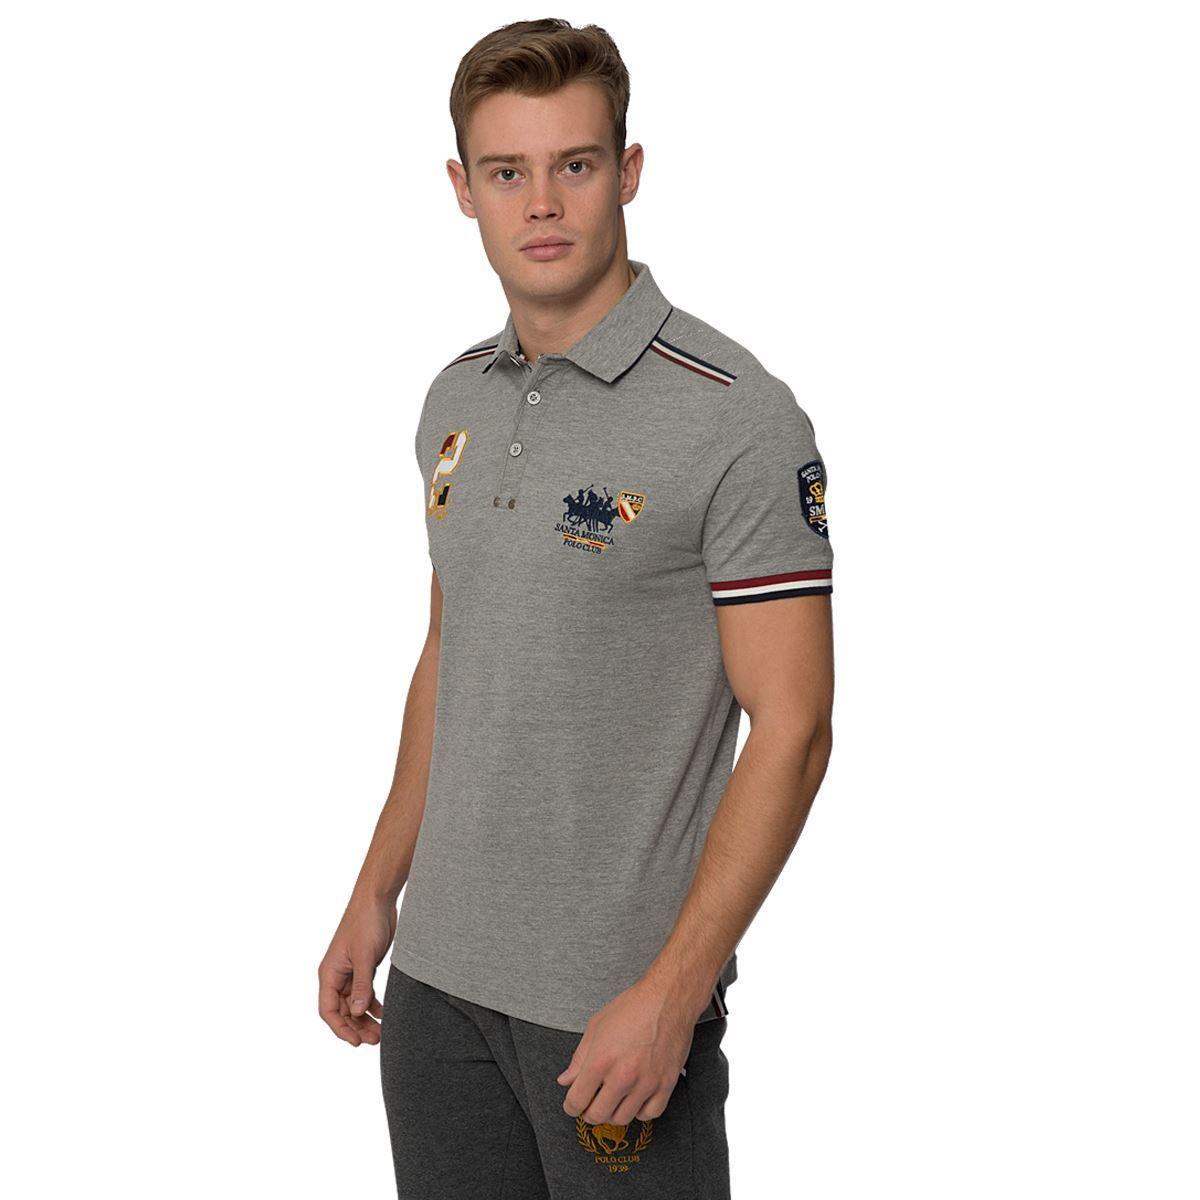 mens casual polo shirt button up short sleeve top santa